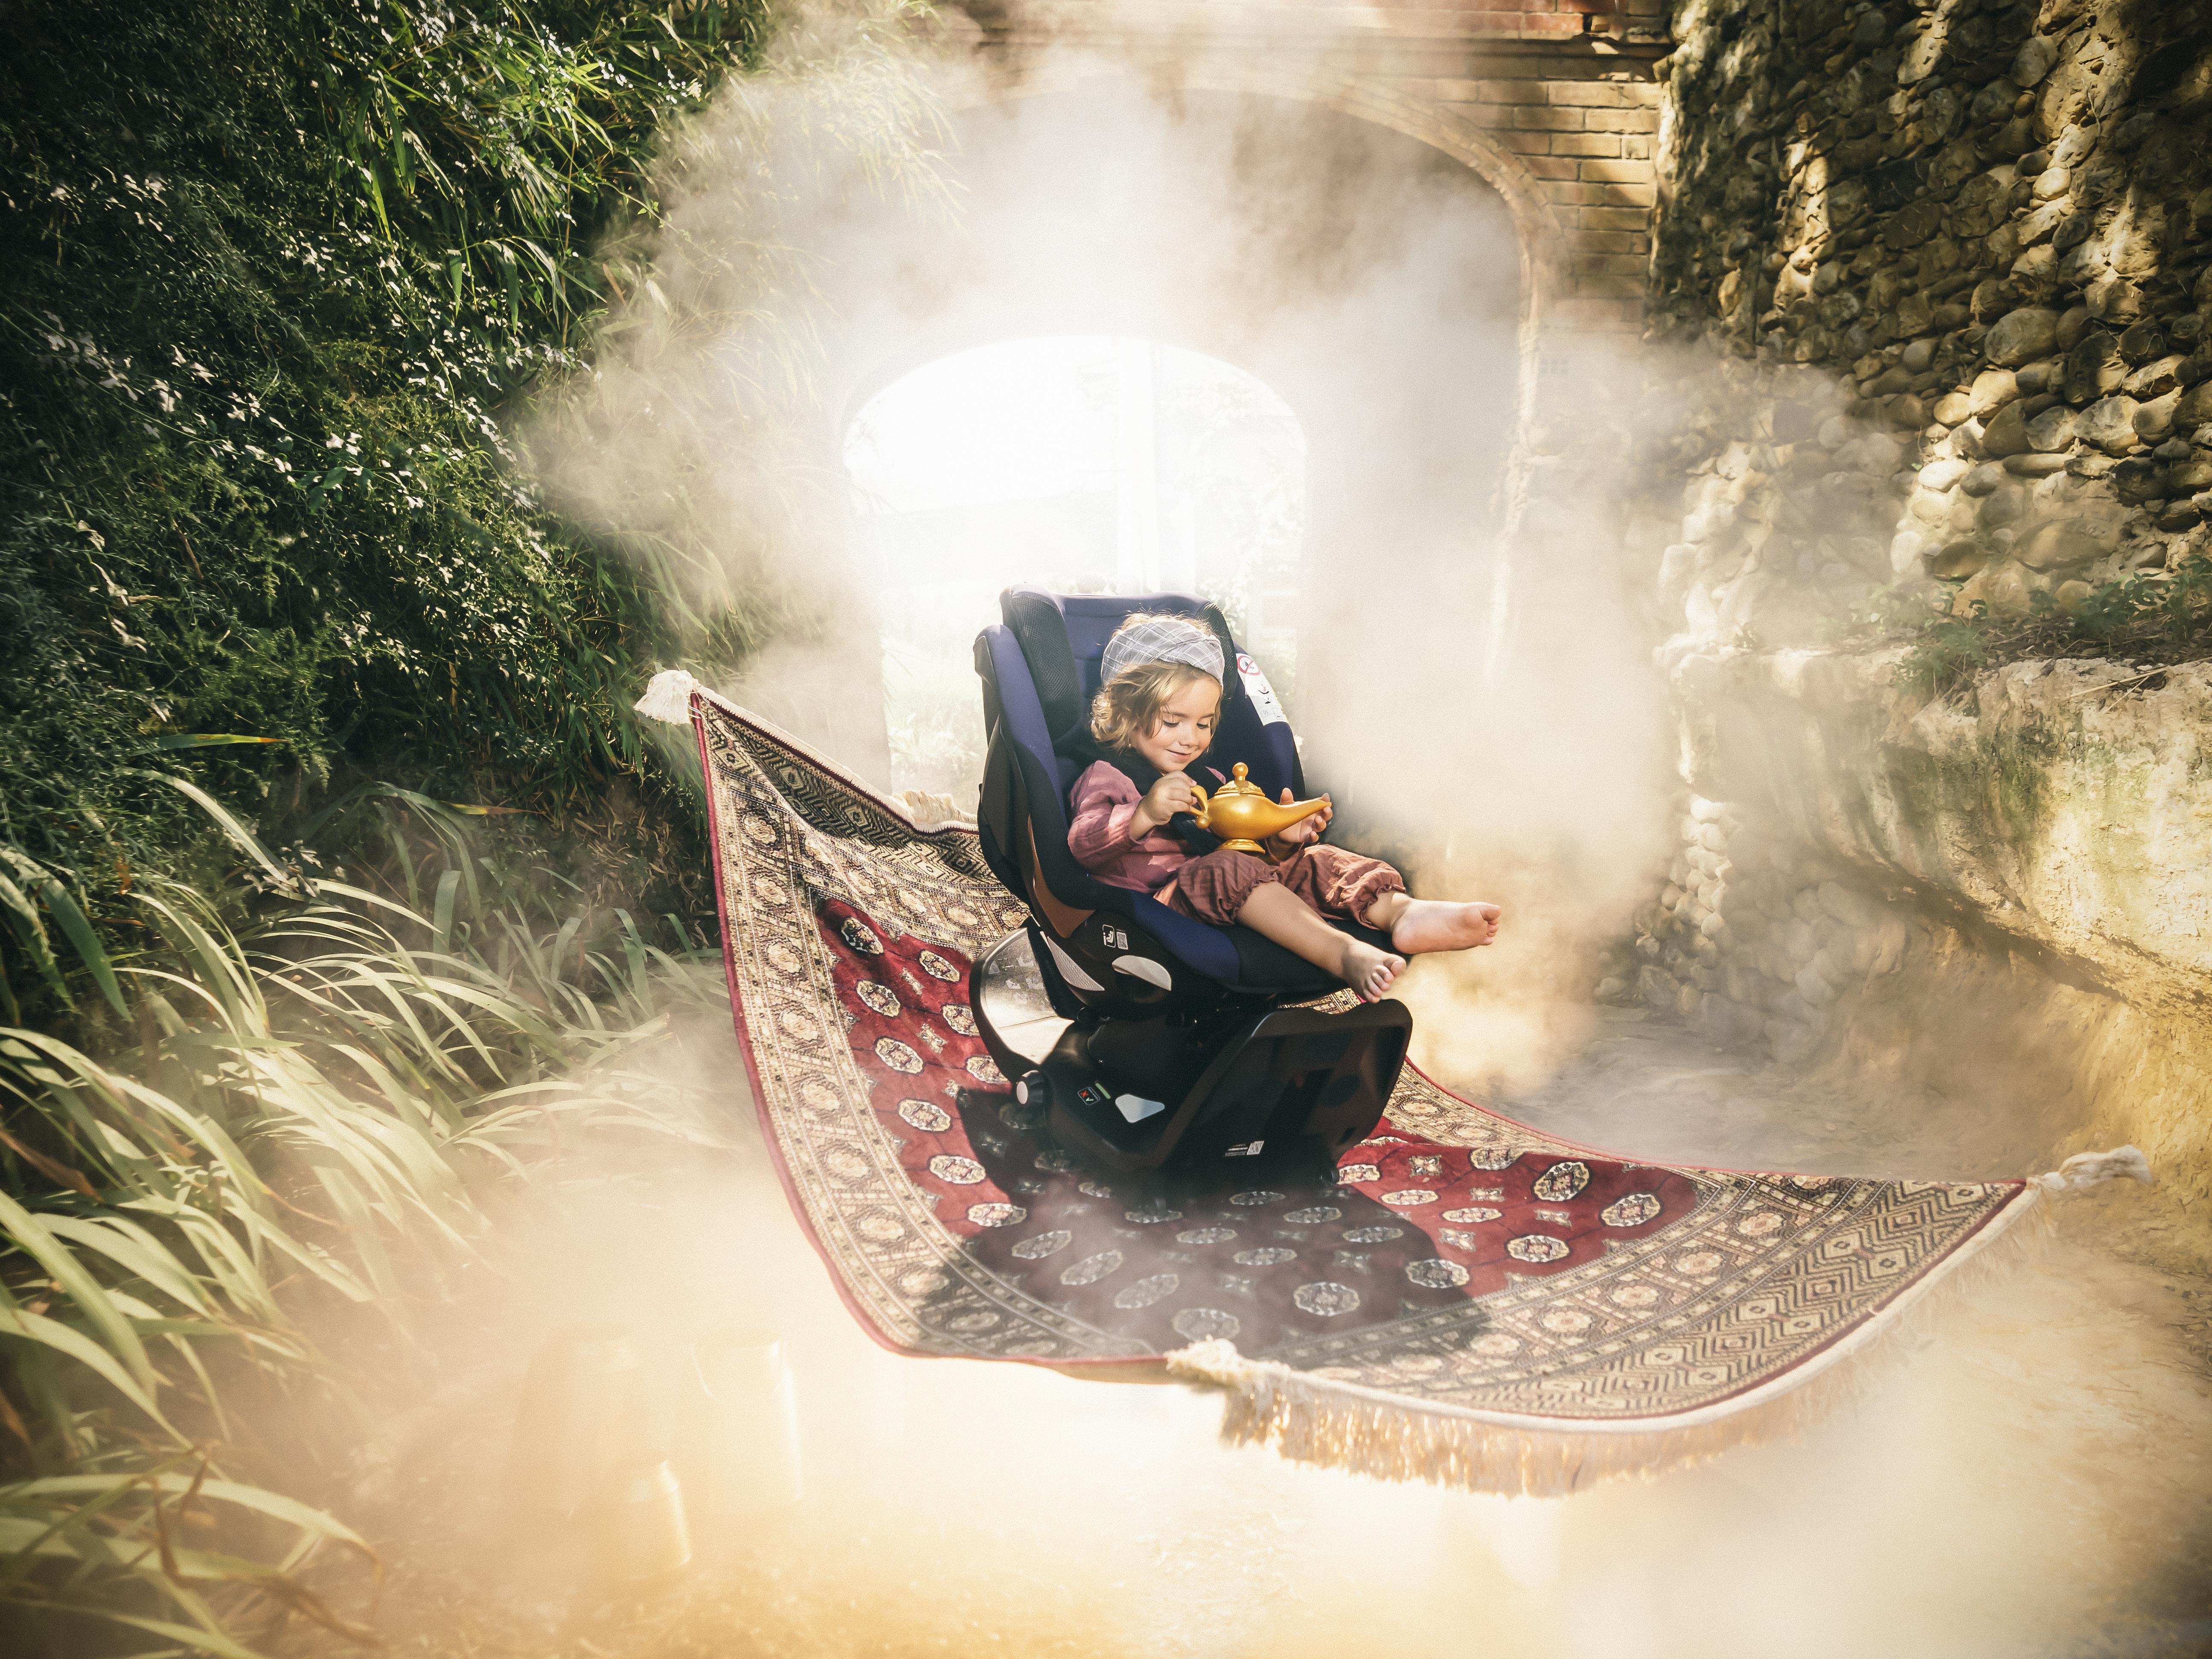 5 razones para alquilar el material infantil en Menorca